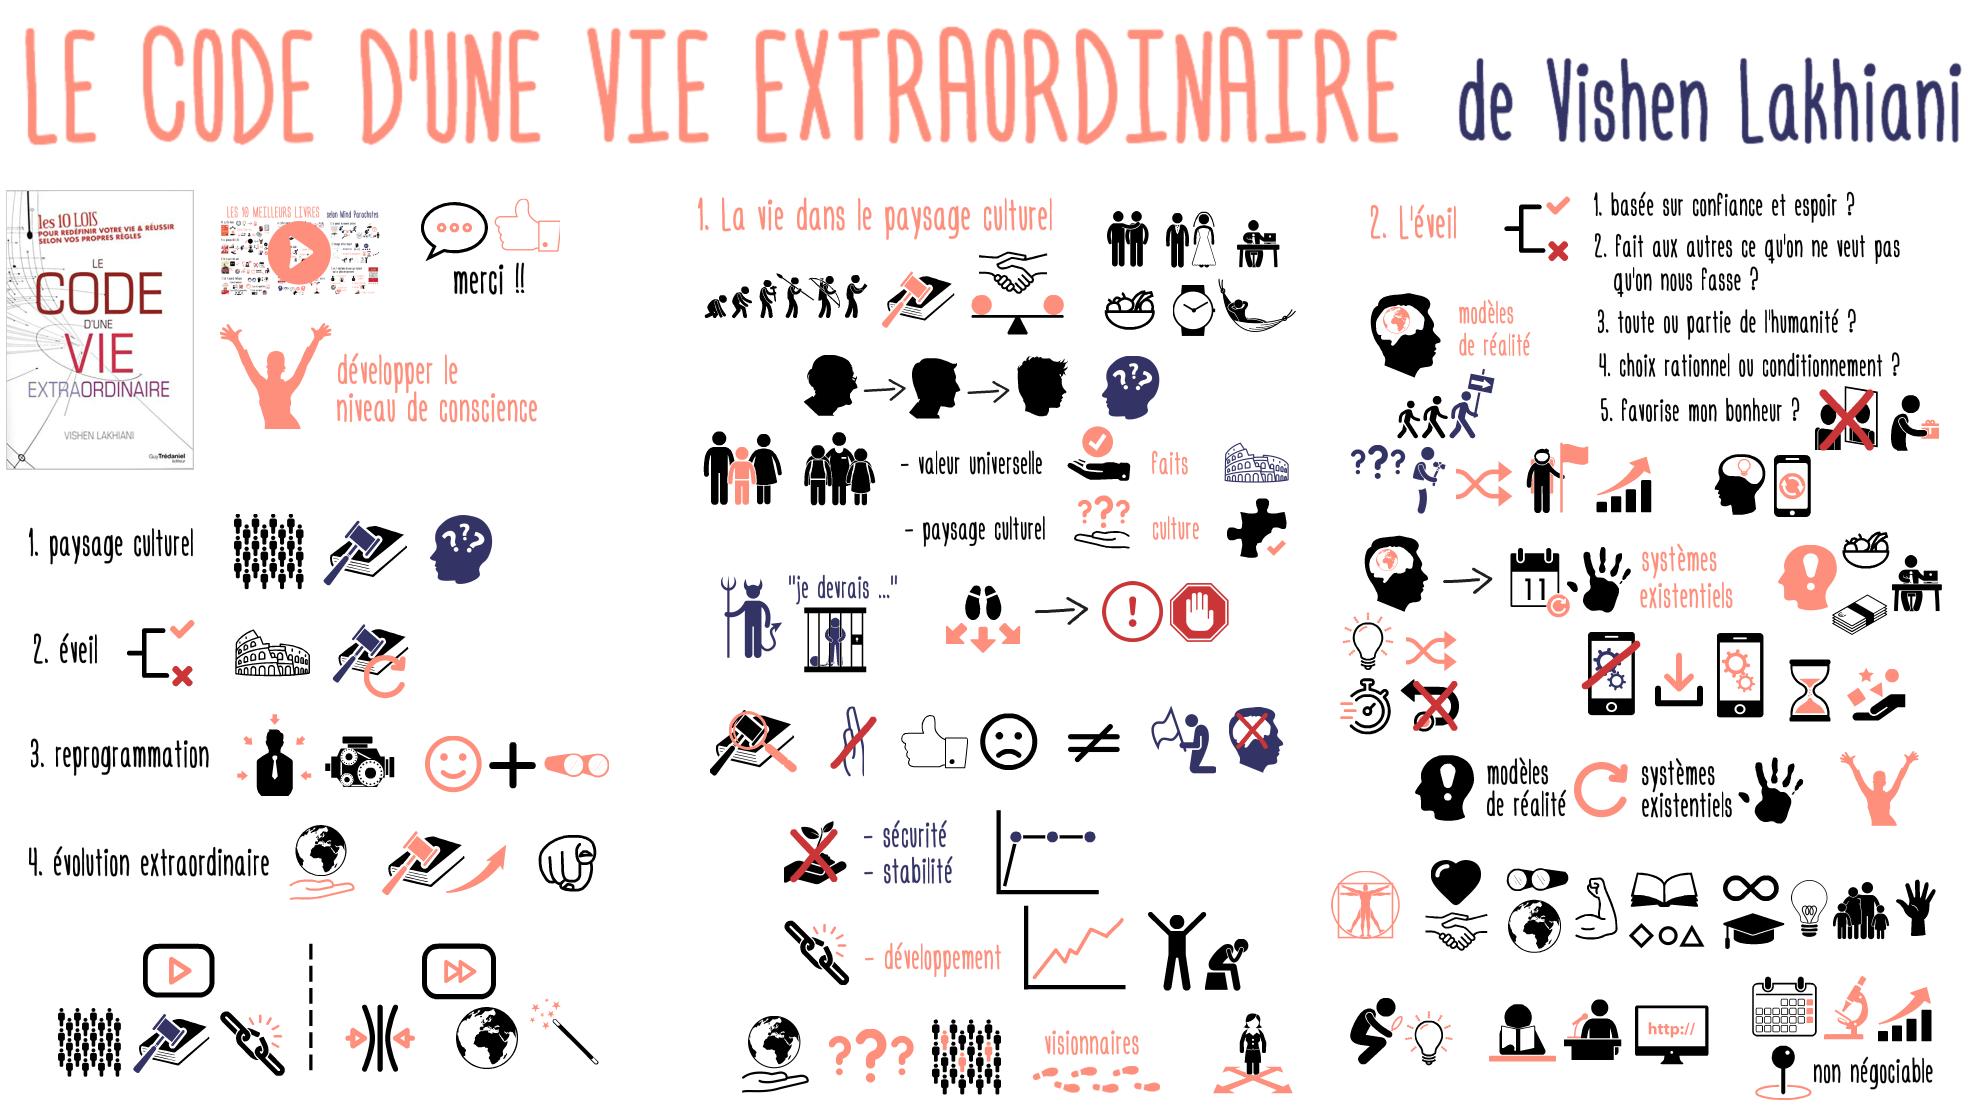 Code Vie Extraordinaire Eveil